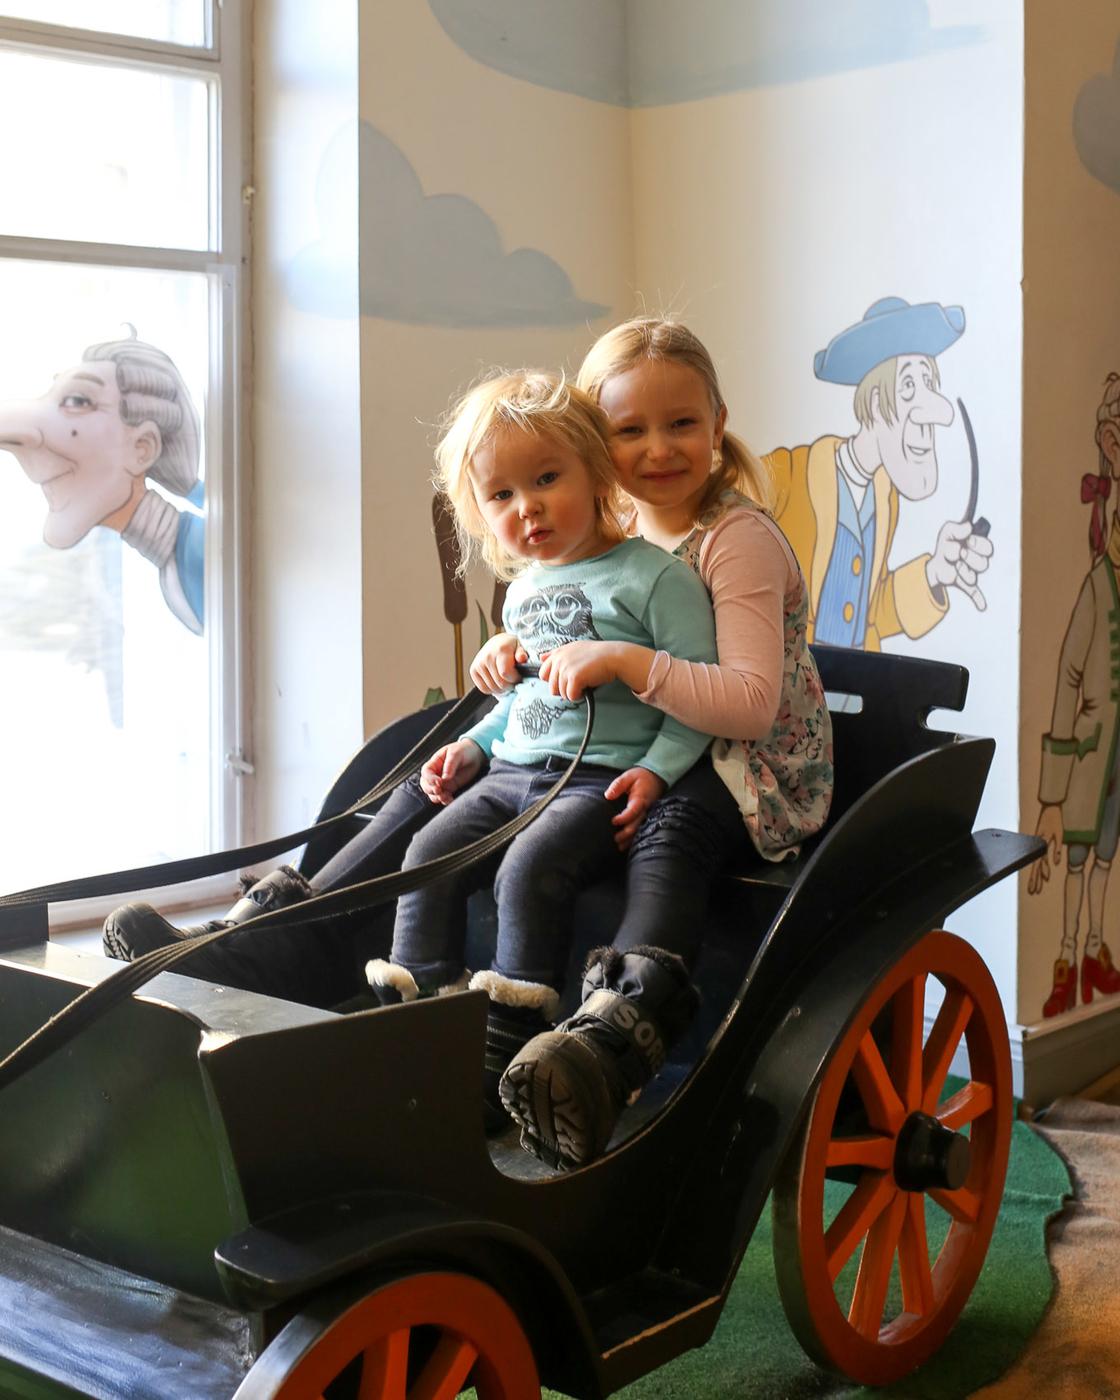 Helsingin kaupunginmuseo - Lasten kaupunki - 18.jpg